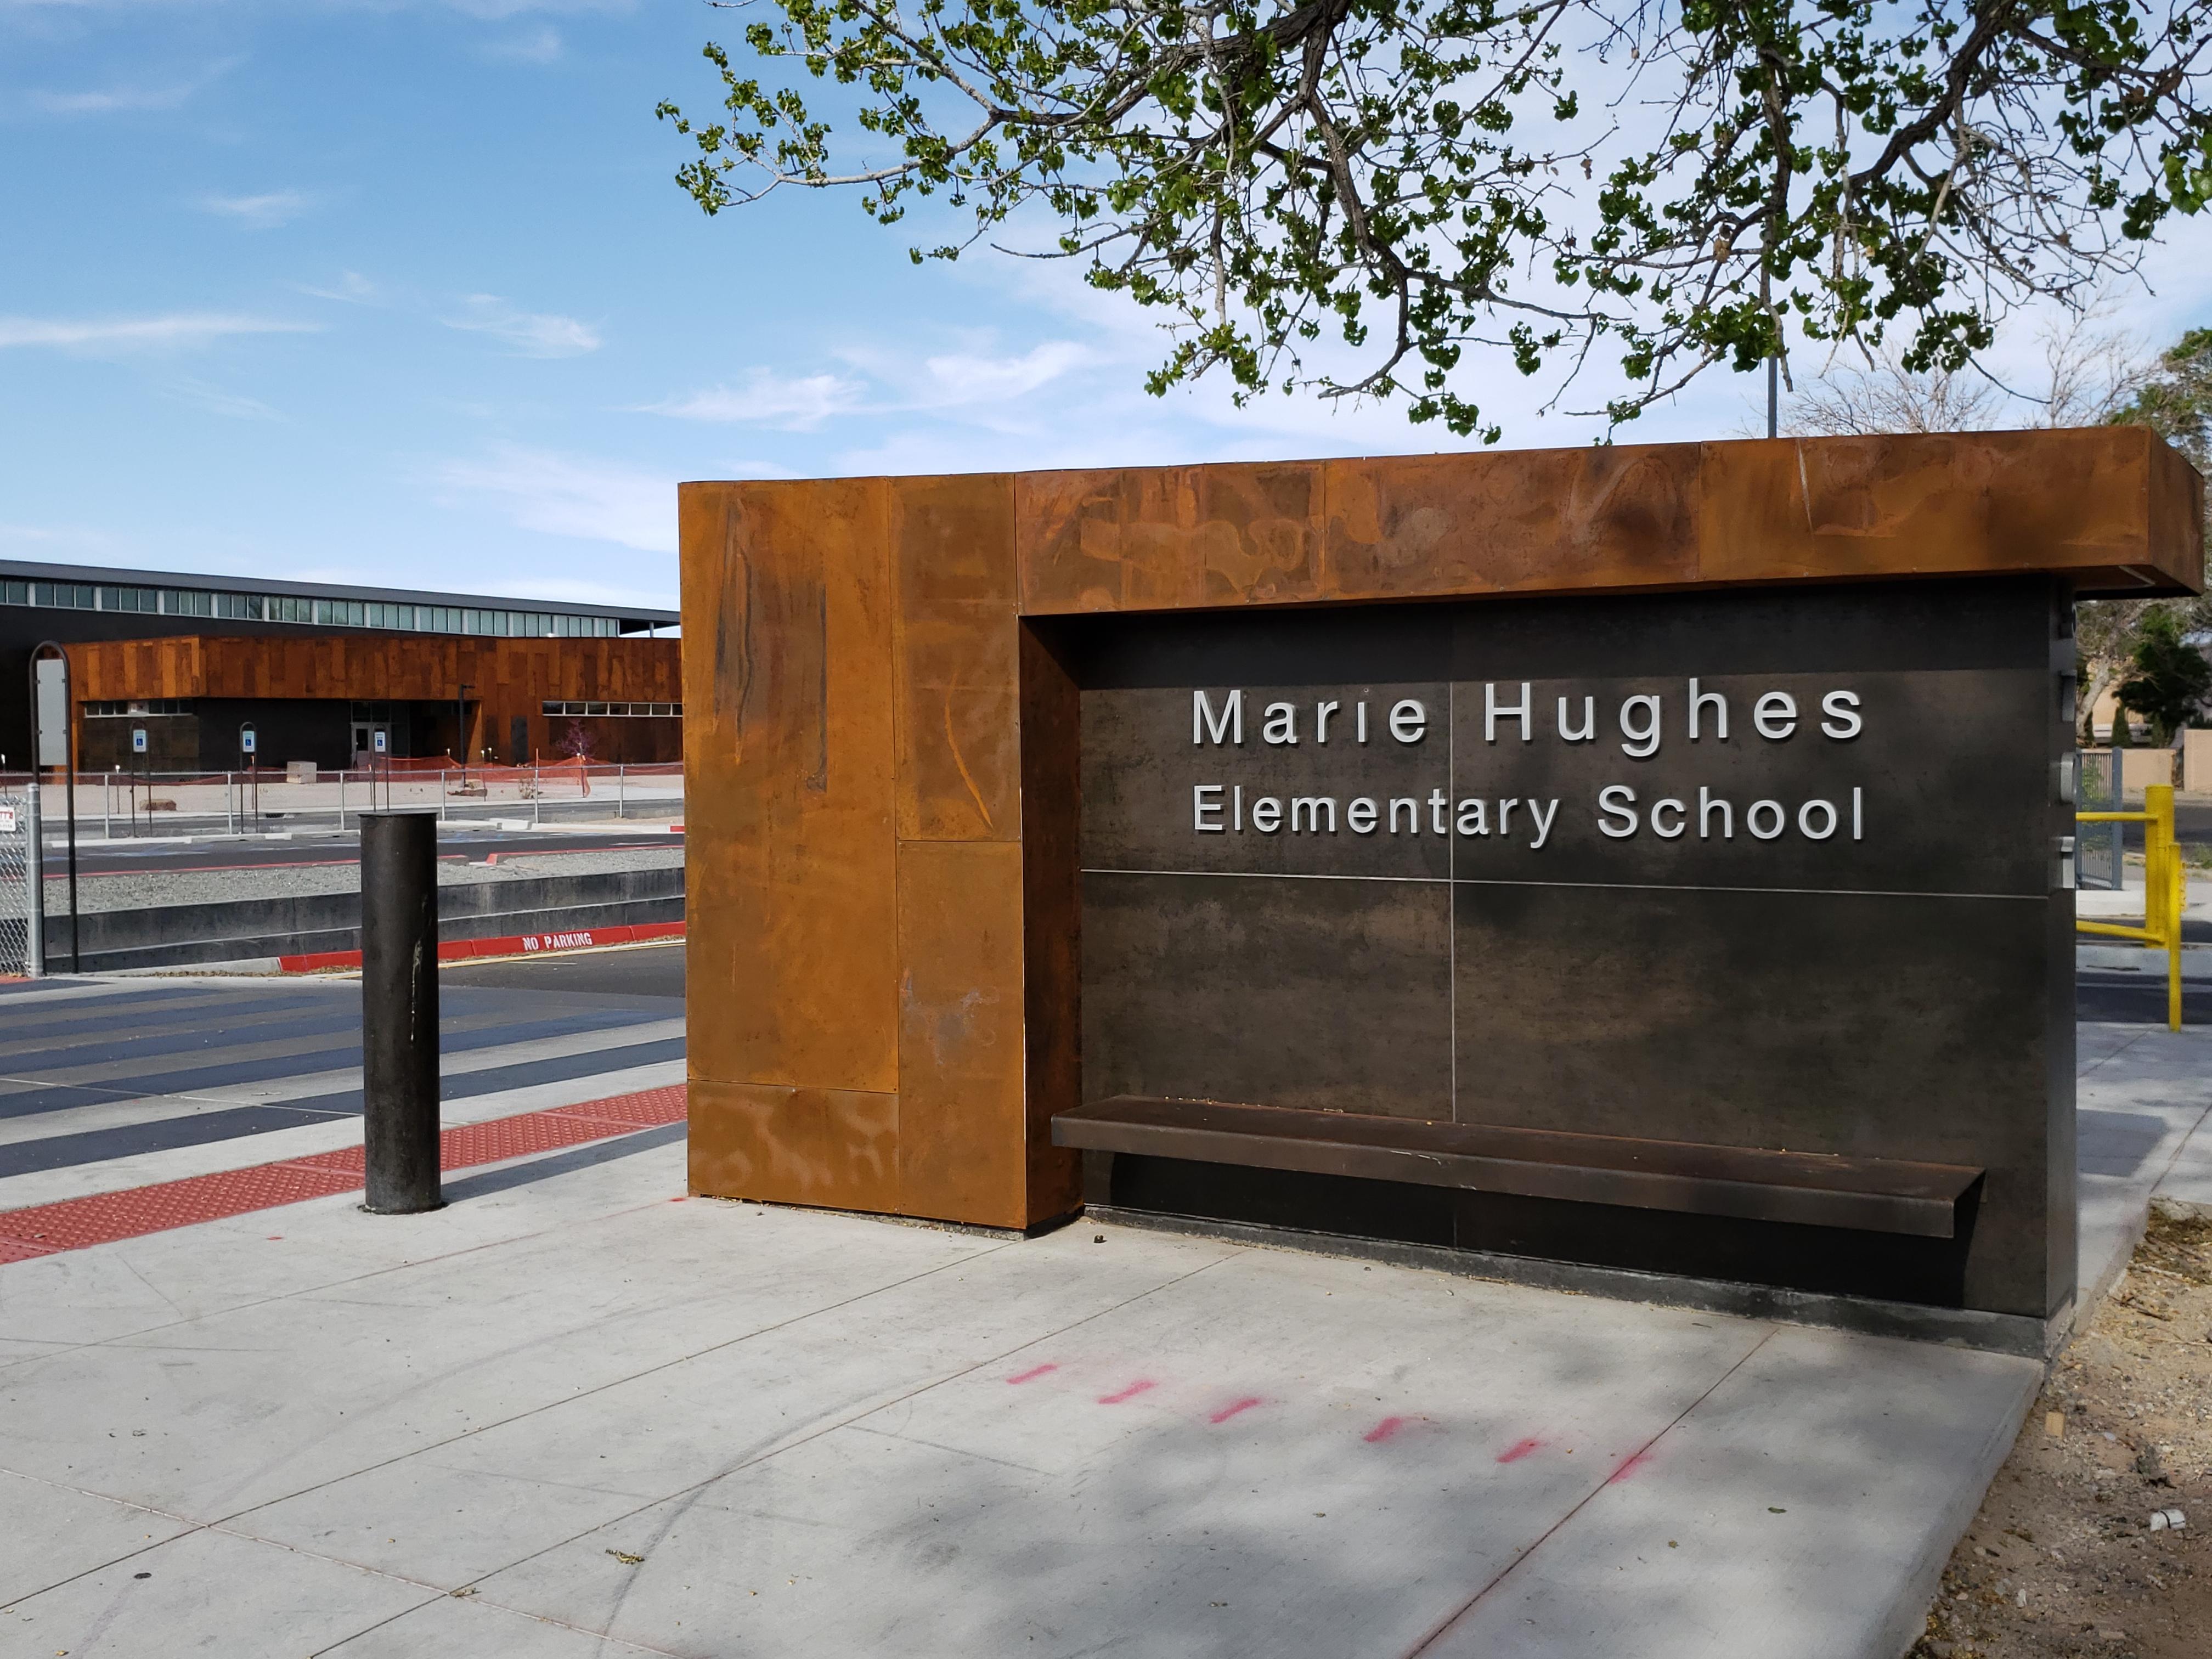 Marre Hughes Elementary